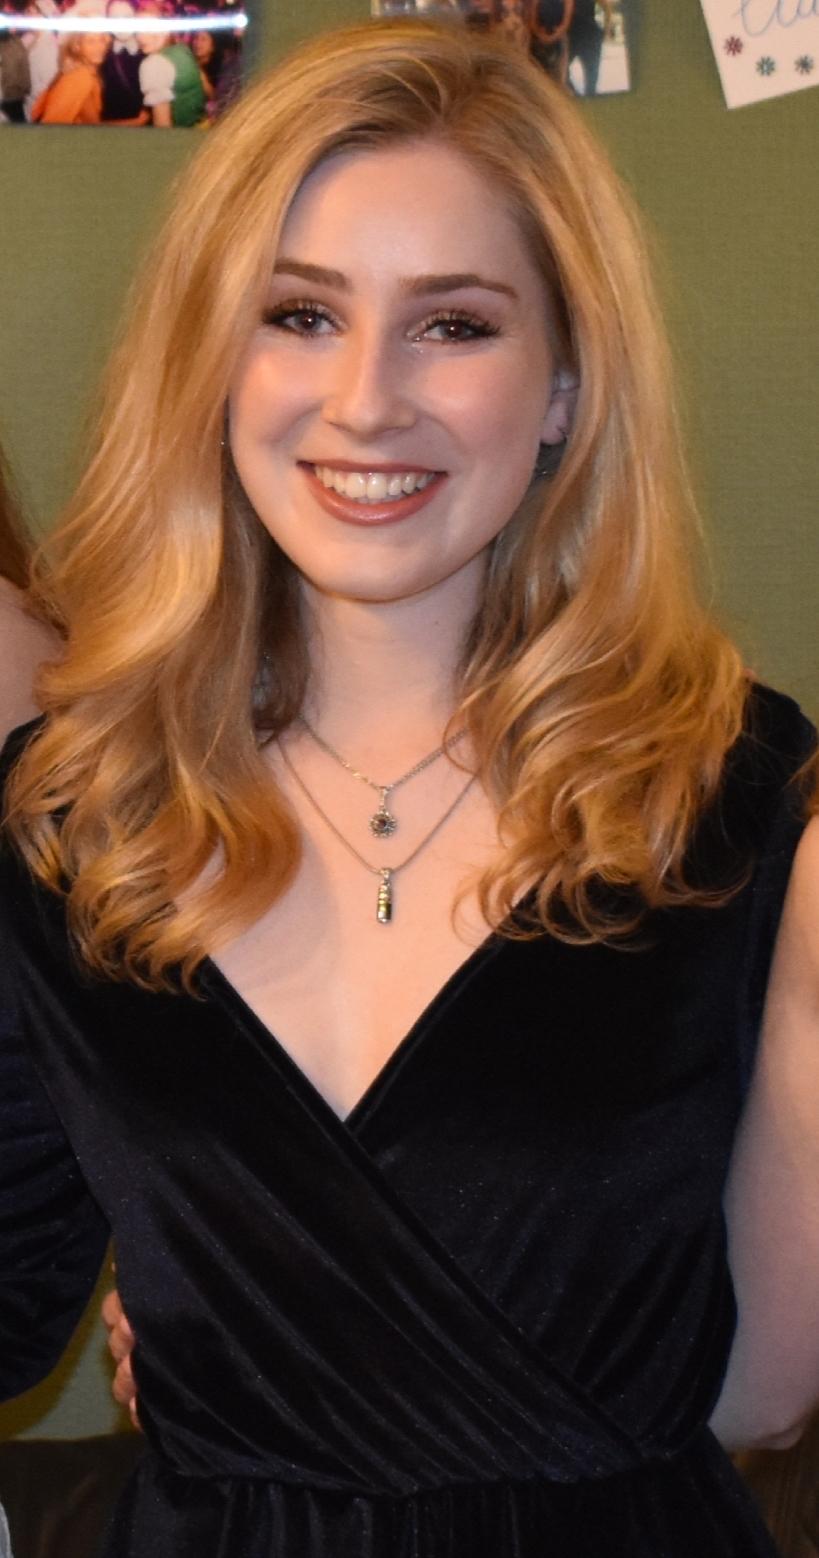 Sarah Lewis - BMEDSCI